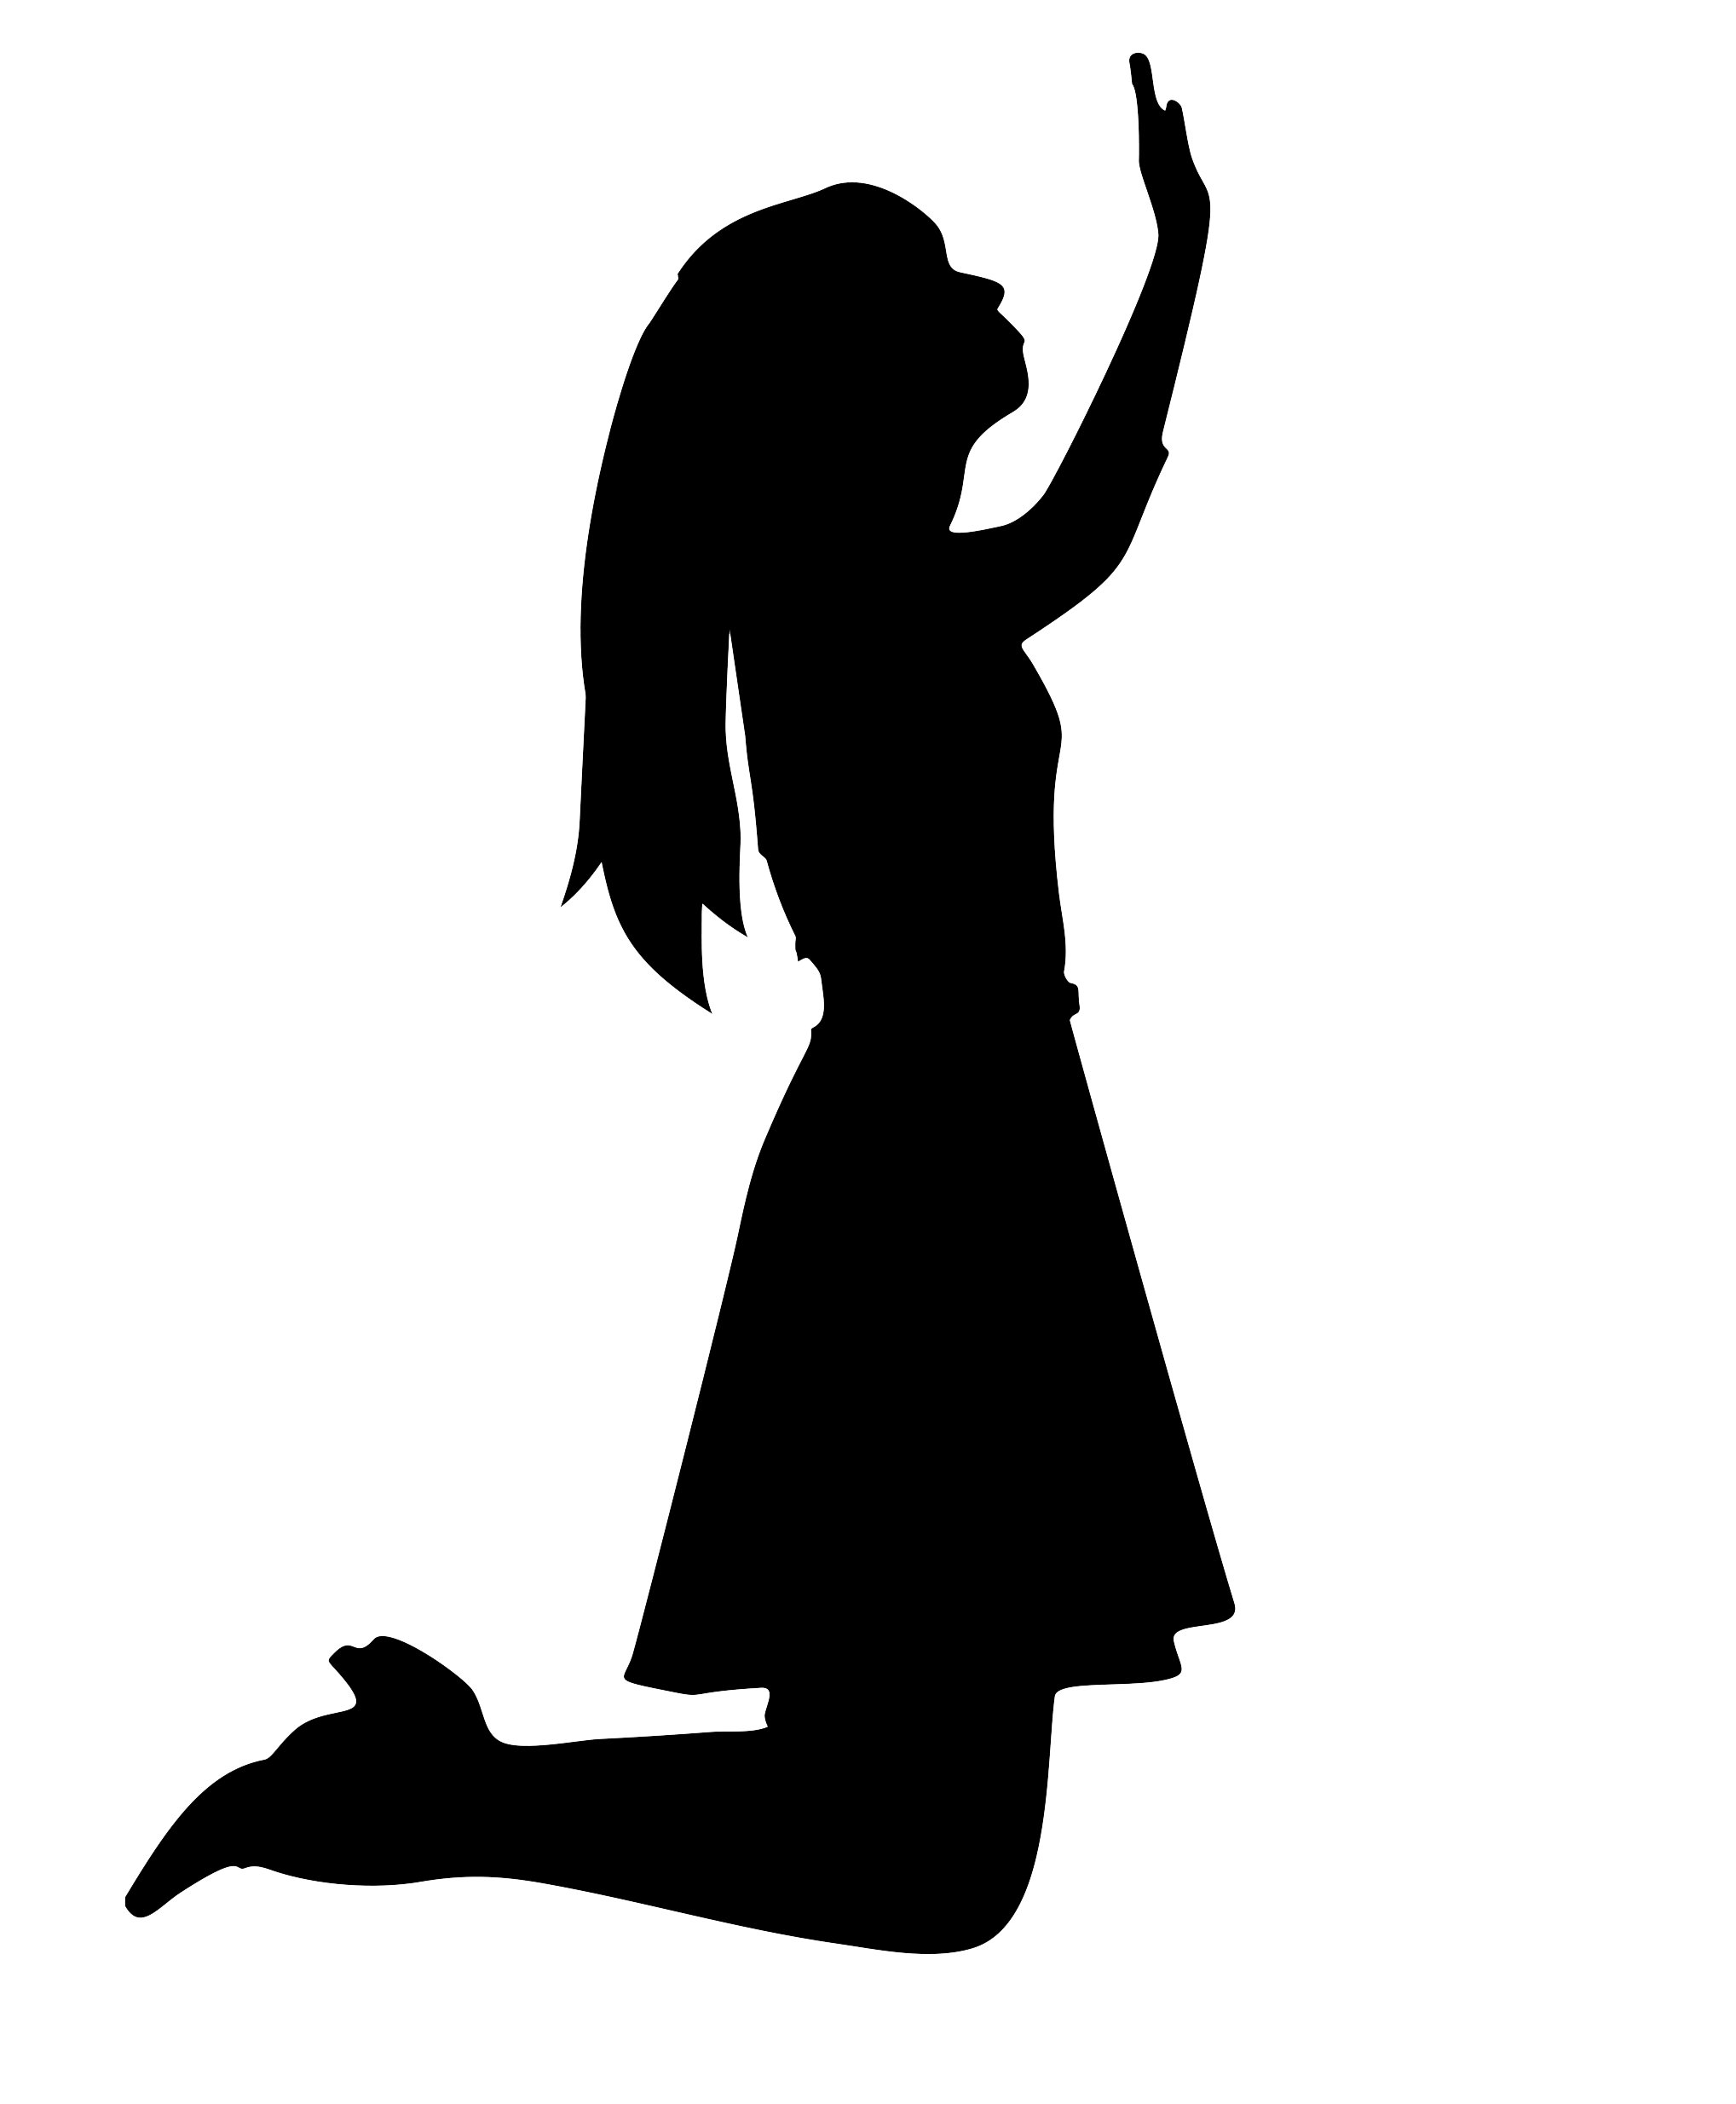 Woman Worship God Liturgical dance.